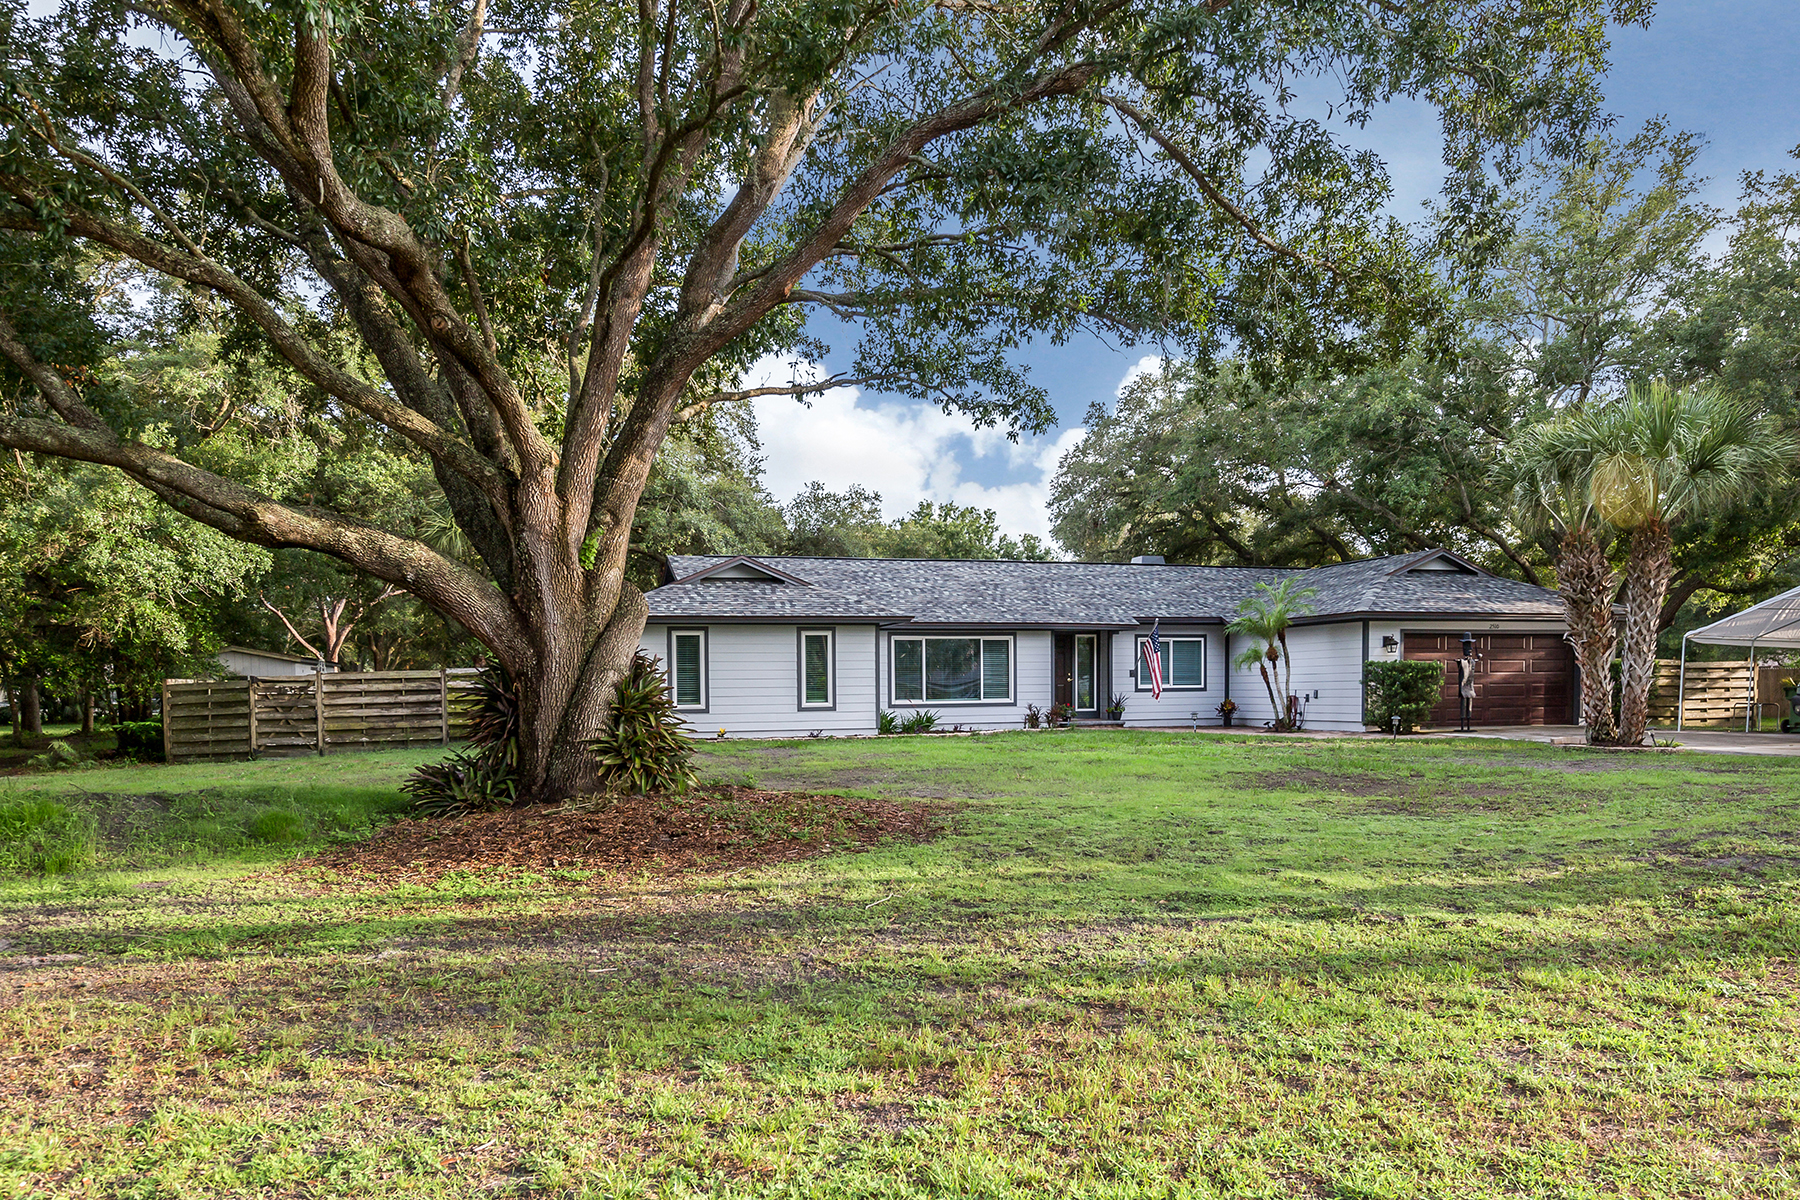 Property のために 売買 アット VENICE ACRES 2510 Northway Dr, ベニス, フロリダ 34292 アメリカ